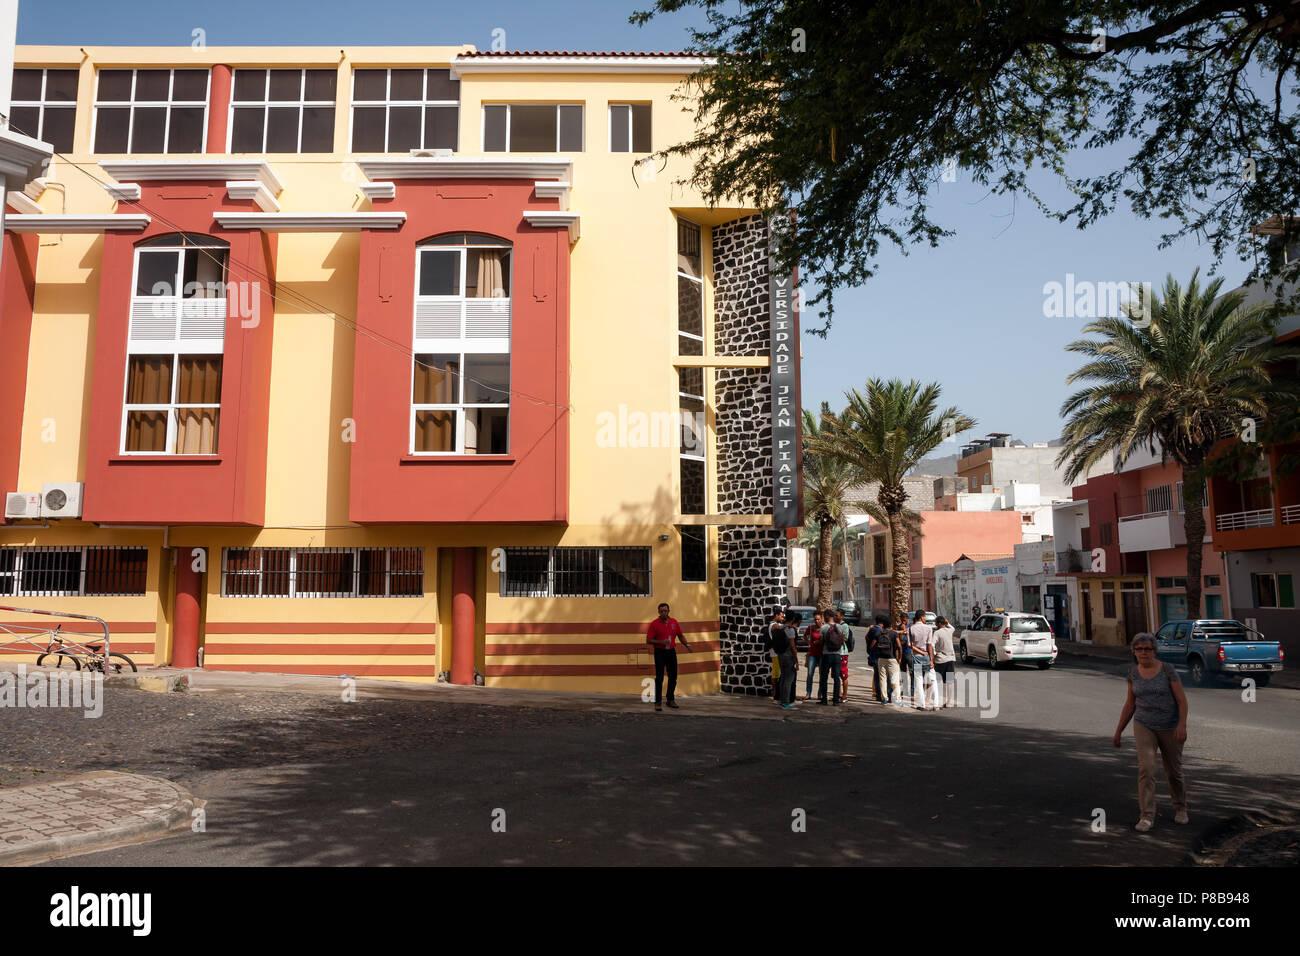 MINDELO, CAPE VERDE - DECEMBER 07, 2015: Students at the Jean Piaget University building Stock Photo